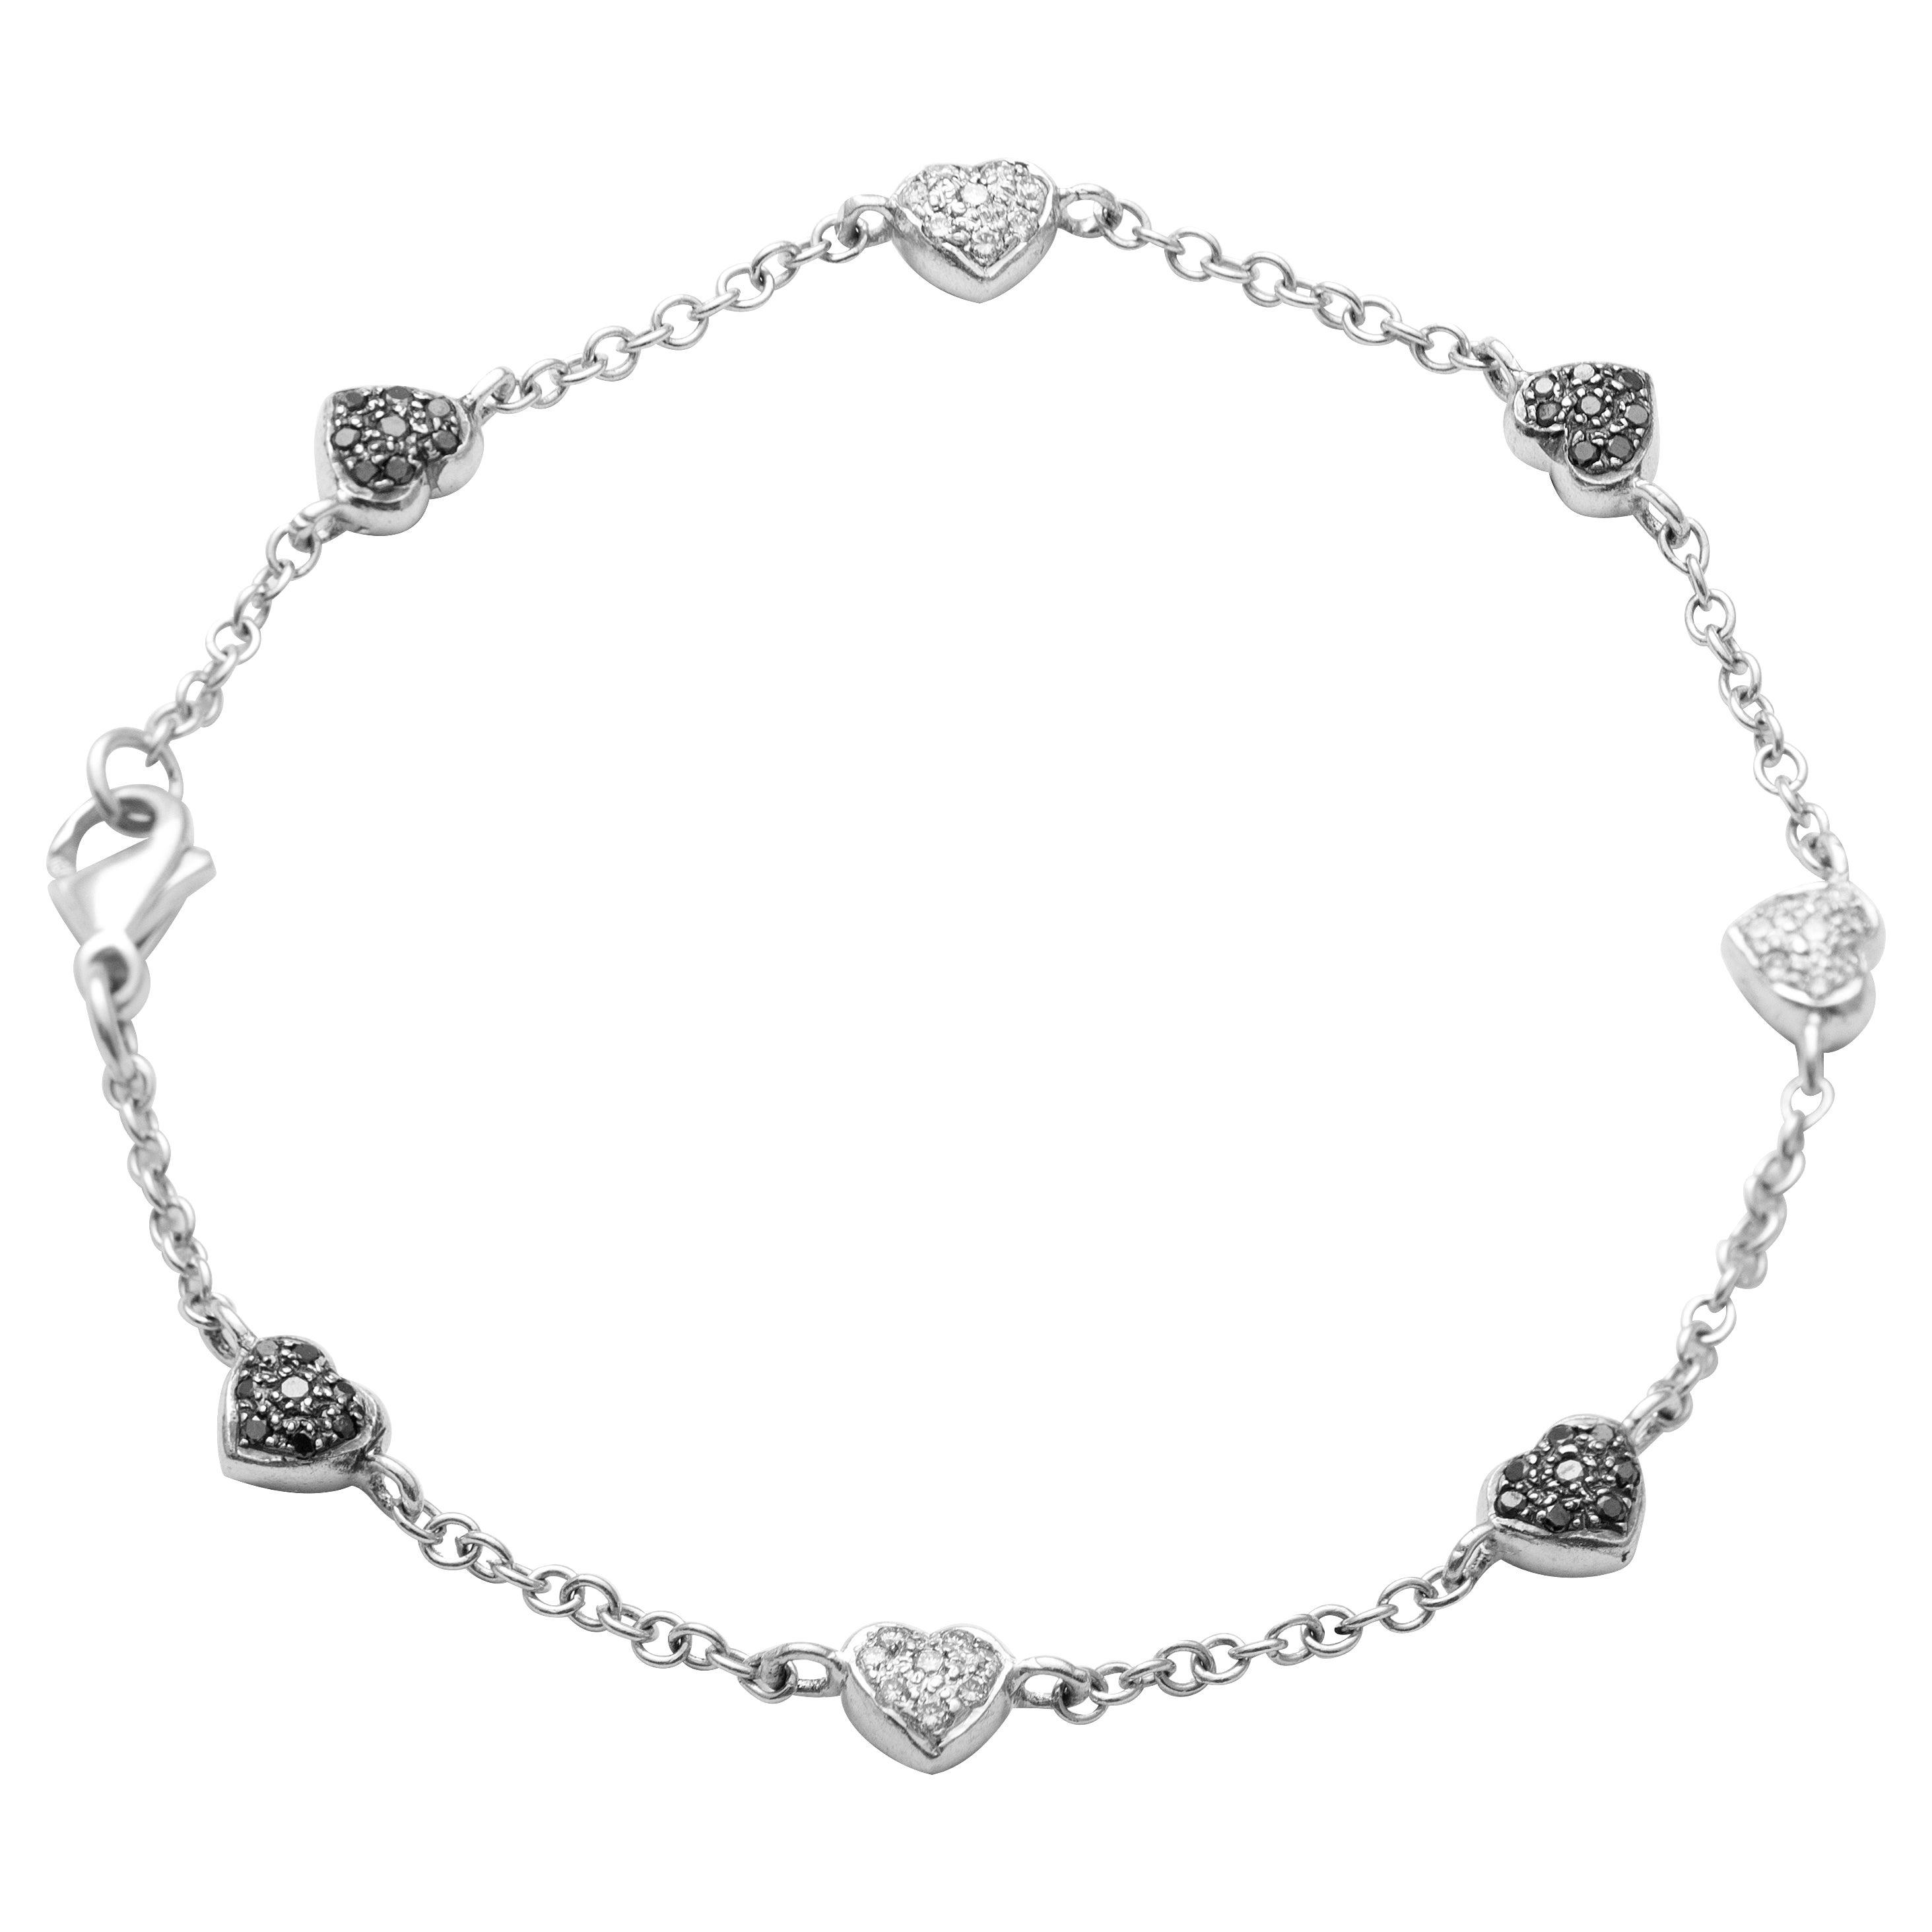 18 Karat White Gold Diamond Charm Bracelet